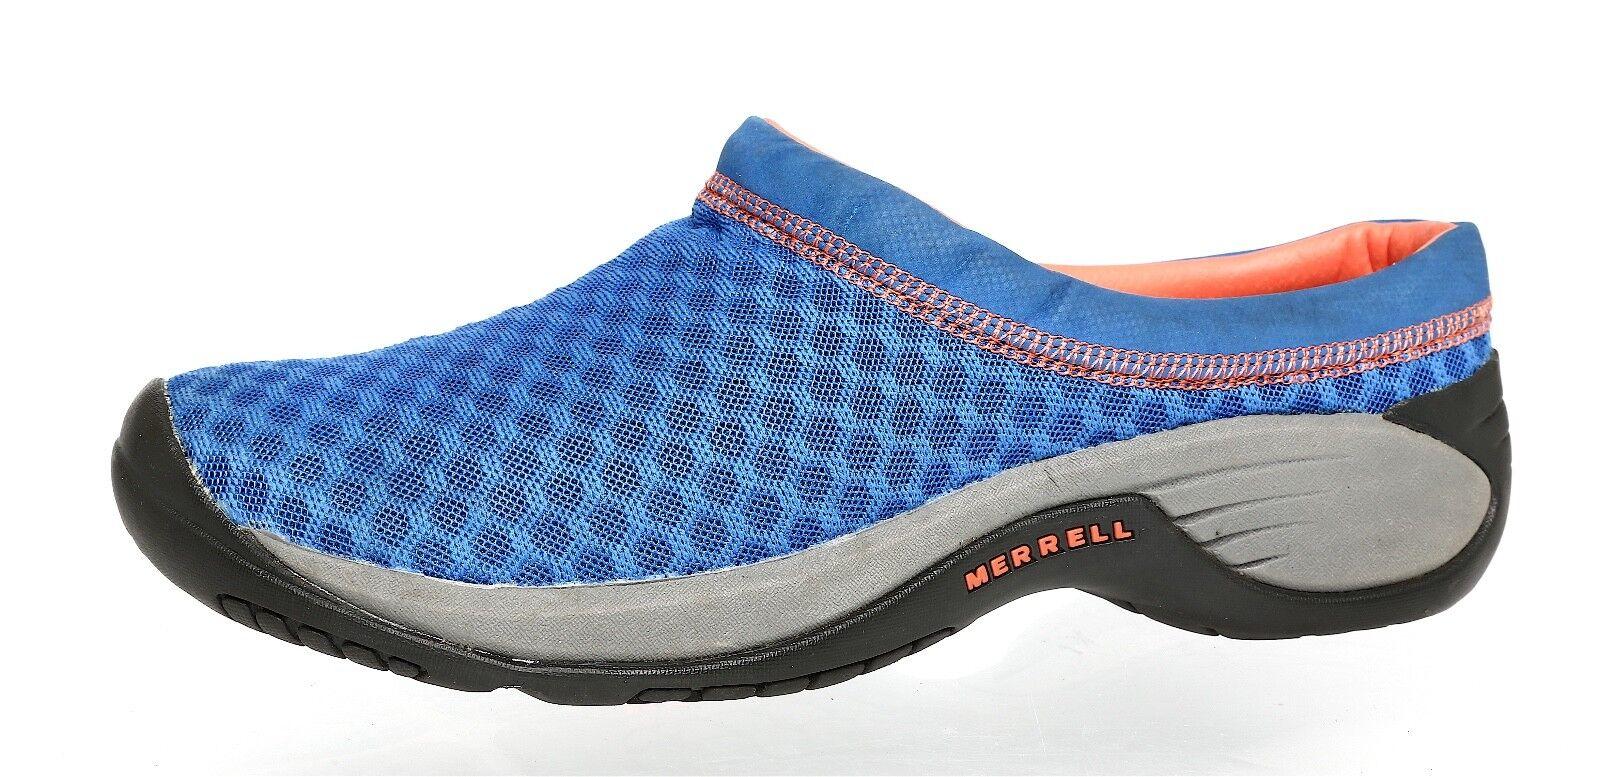 Merrell Victoria Victoria Merrell Performance Footwear Blue Women Sz 7 1238 e4a4cf